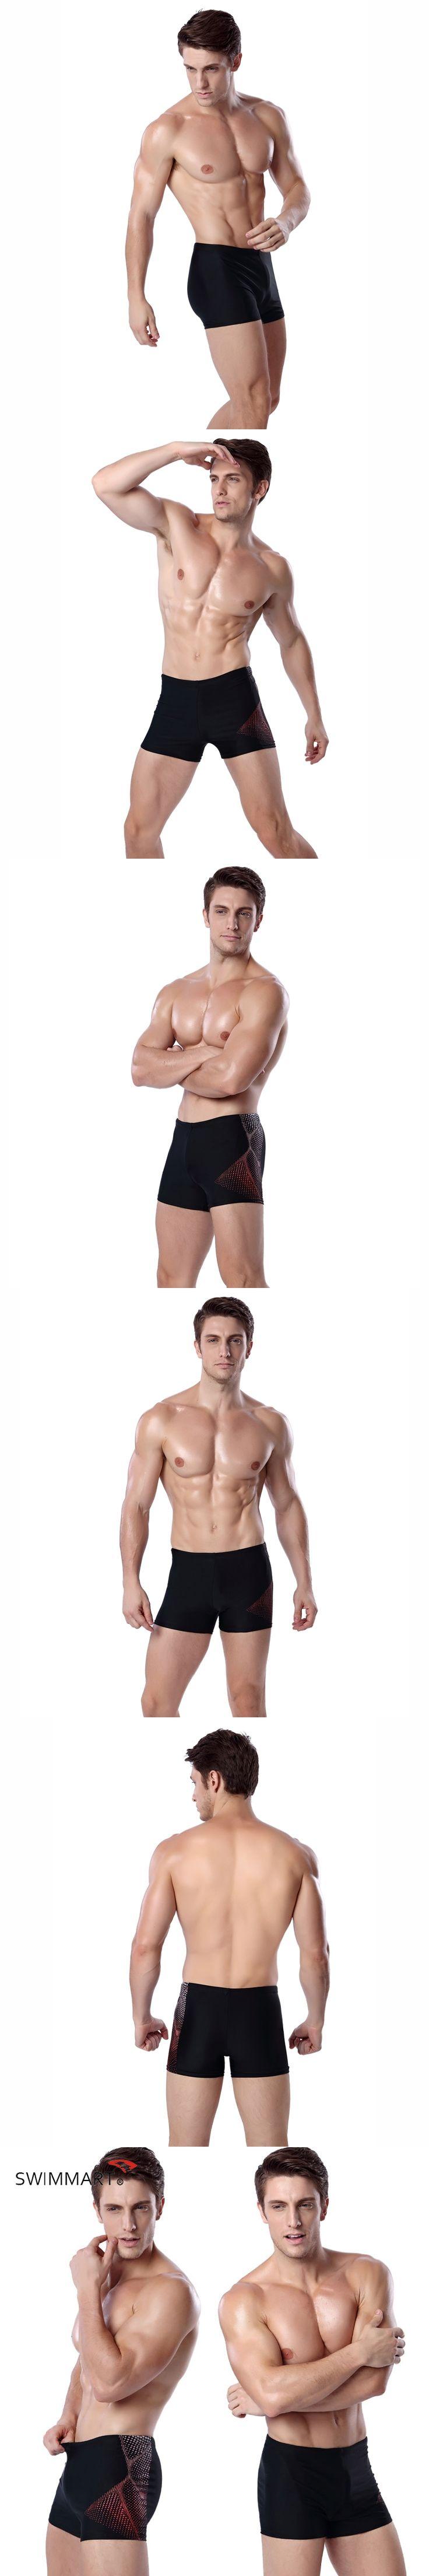 SWIMMART  Men's Man Swimwear Swimsuits Swimming Shorts Sports Suits Surf Shorts Sexy Trunks Men Swim Suits Summer MS013